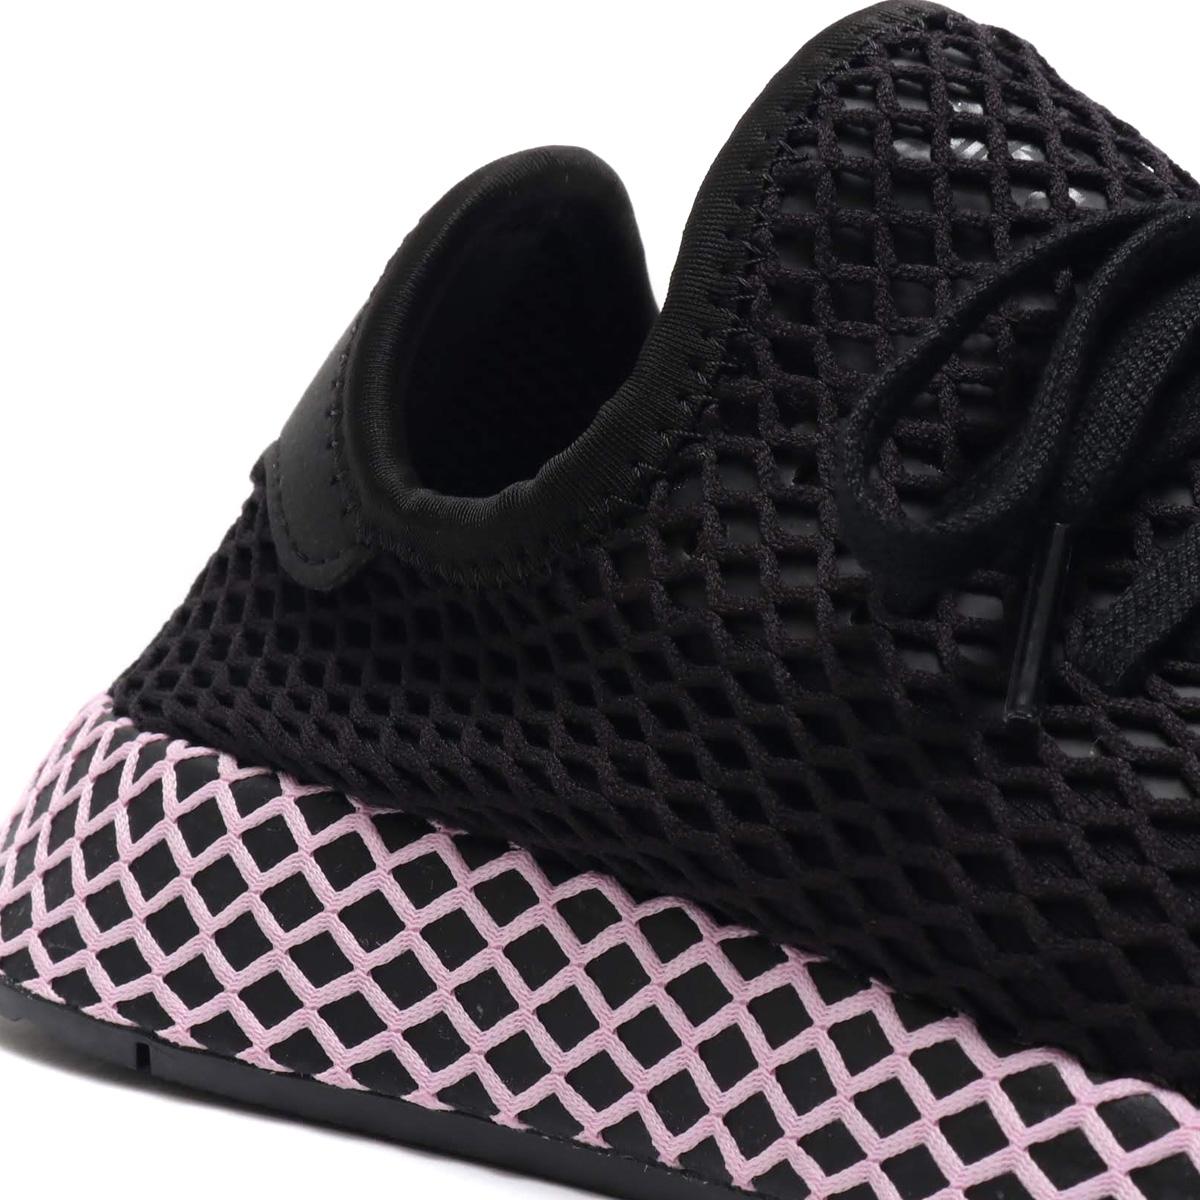 946b7385a adidas Originals DEERUPT RUNNER W (アディダスオリジナルスディーラプトランナー W) CORE BLACK CORE  BLACK CLEAR LILAC 18FA-I